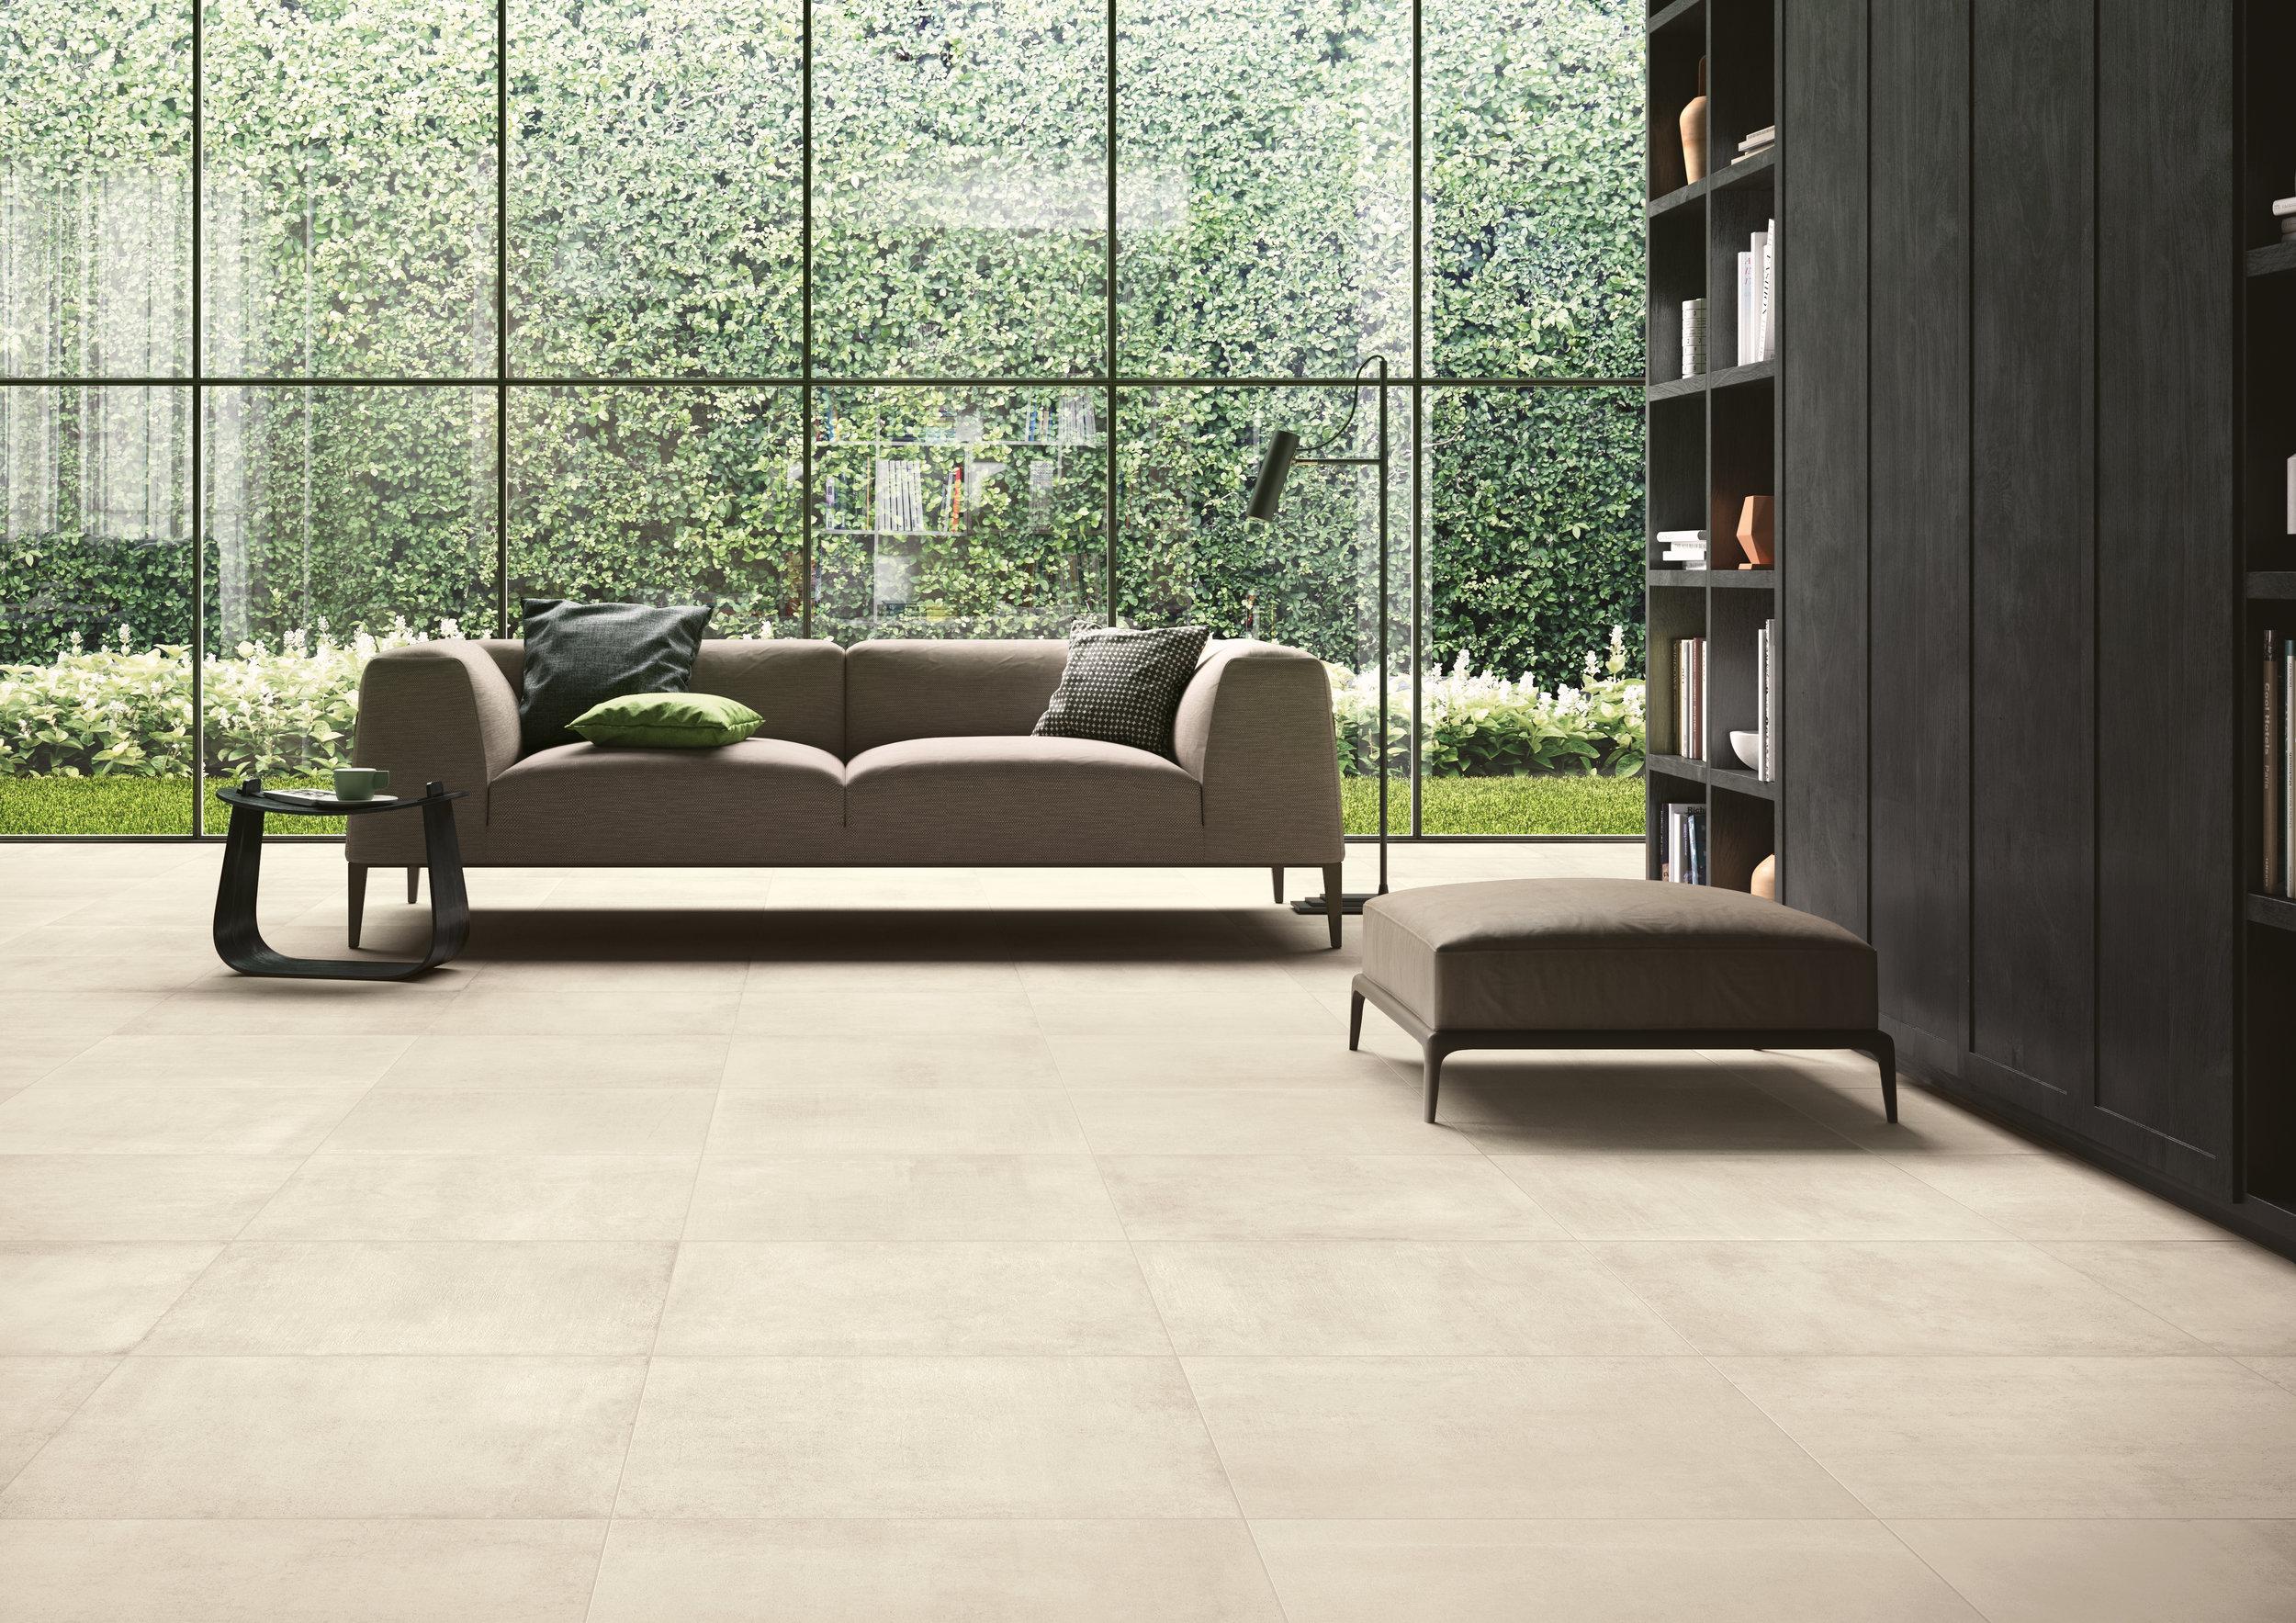 BLU-concretejungle-atelier25-natural-10mm-living-001.jpg